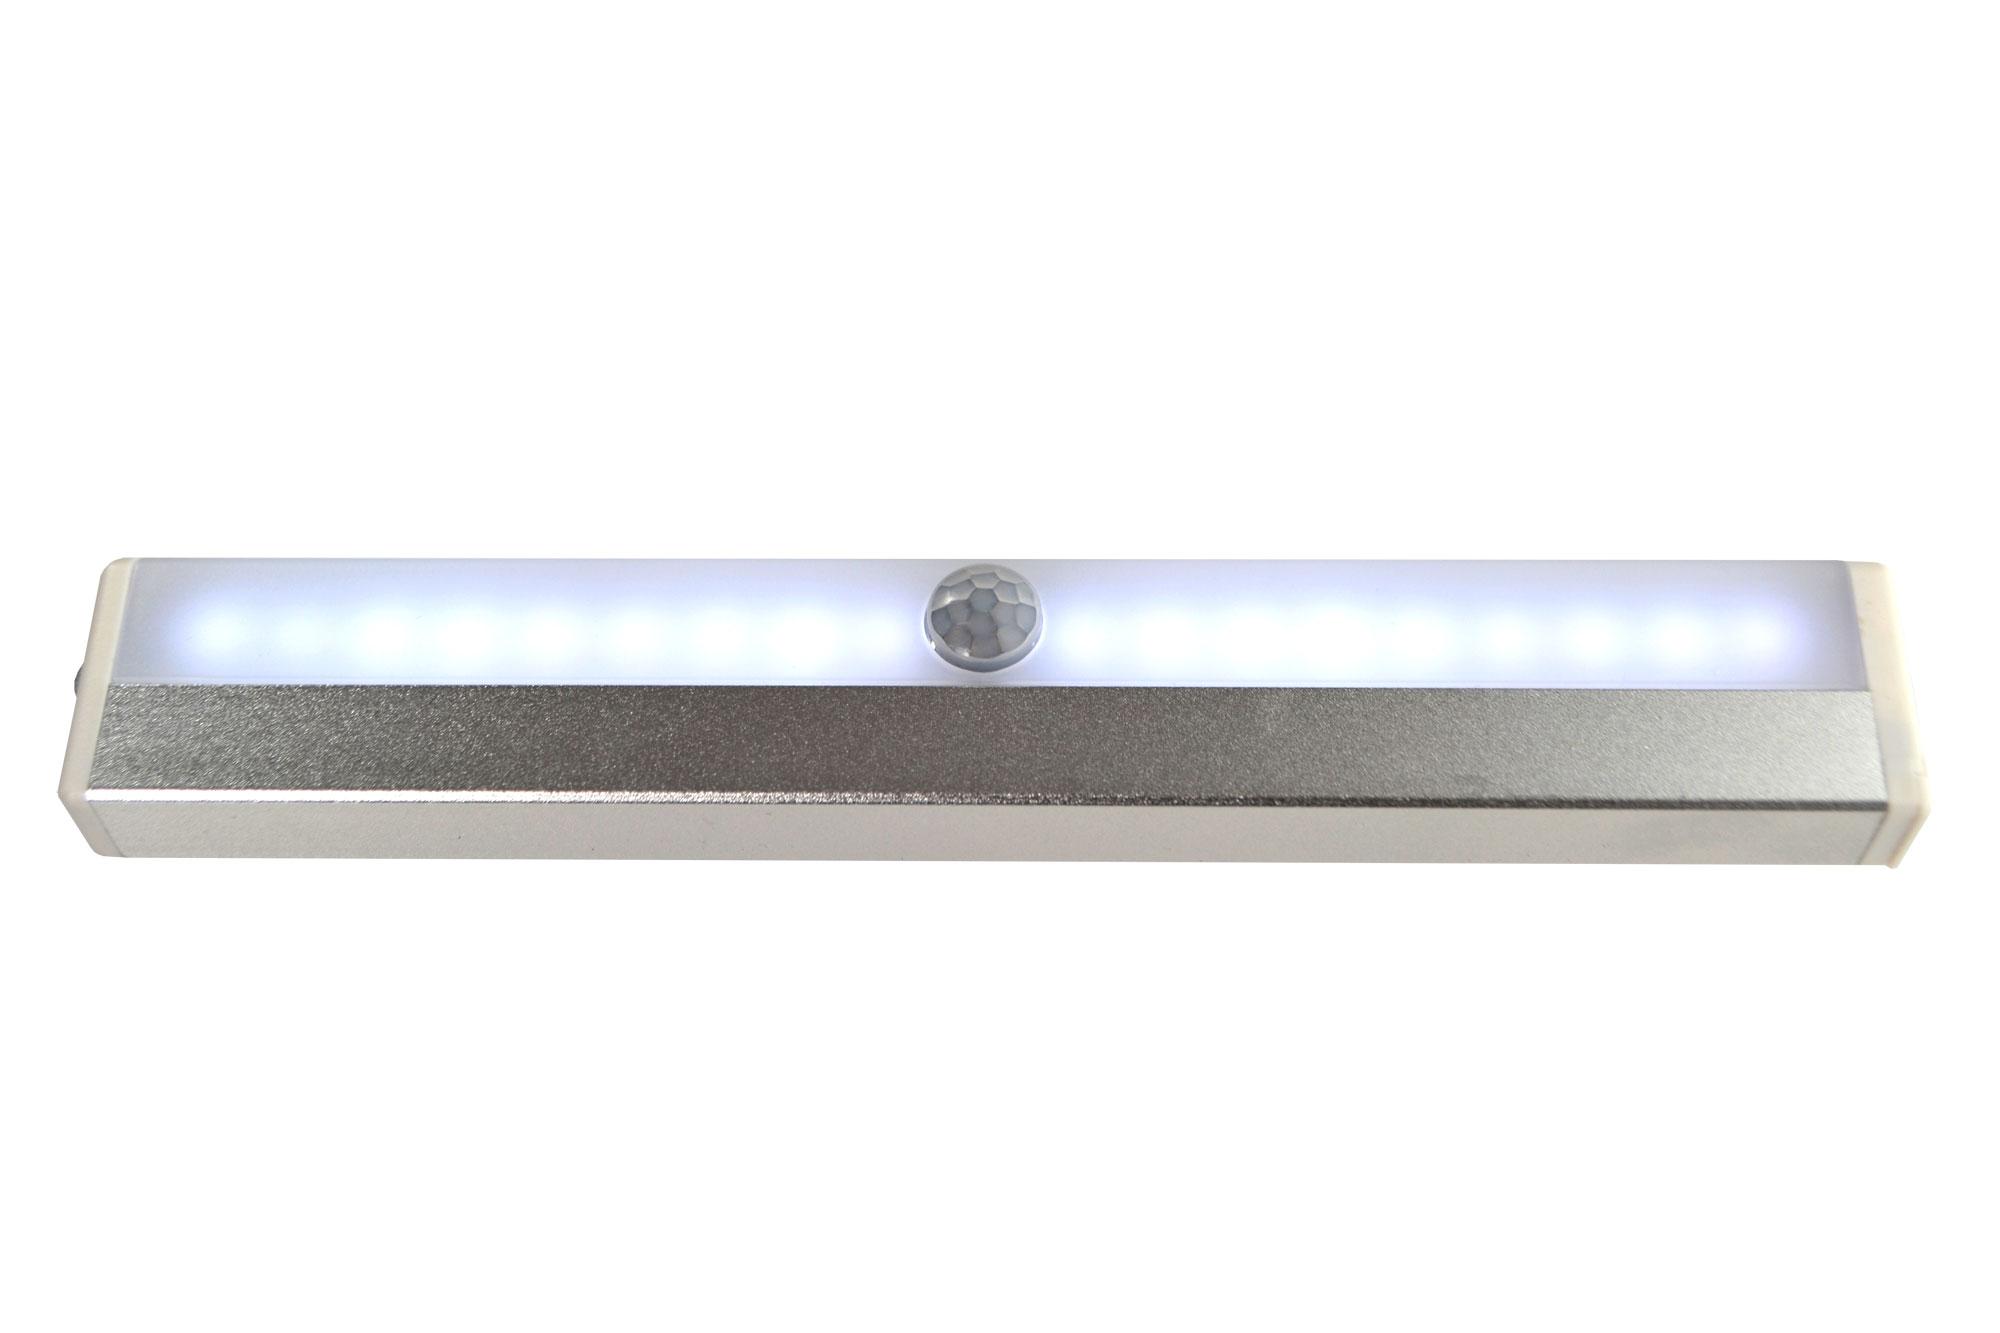 Rottner Tresorlicht mit Bewegungssensor Sensorlight Bild 1